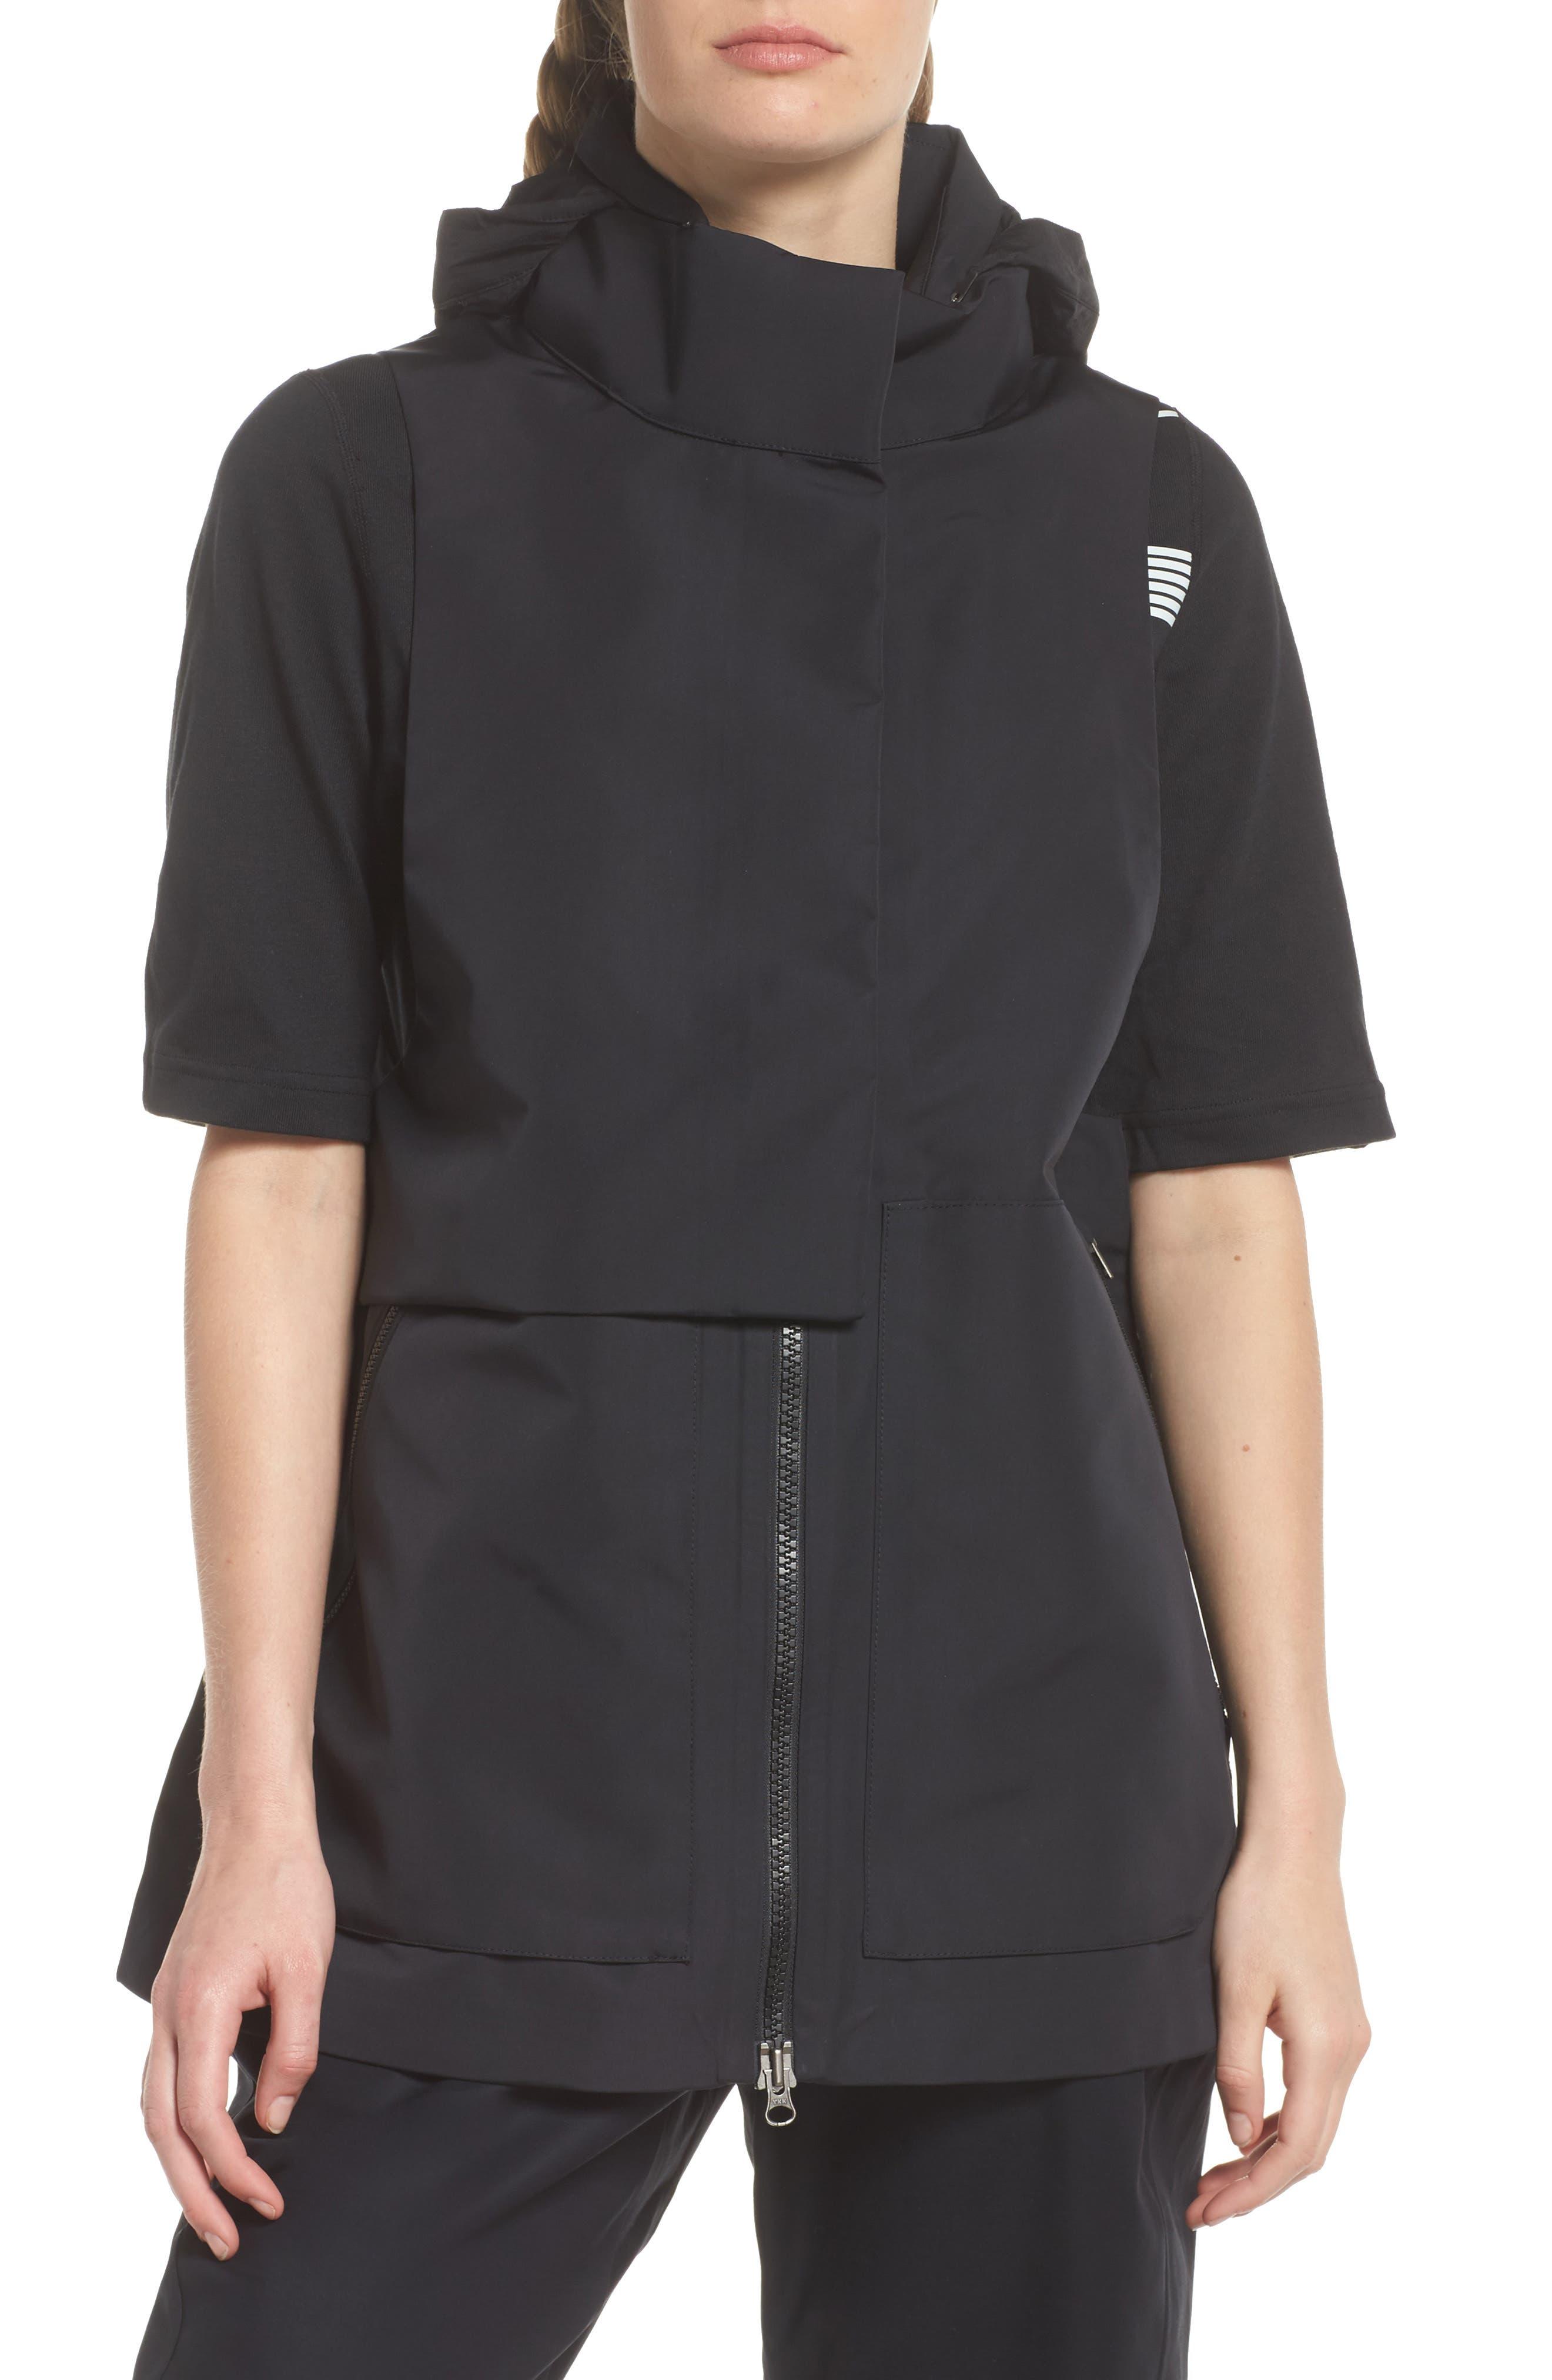 NikeLab ACG Water Repellent Women's Hooded Vest,                             Alternate thumbnail 6, color,                             010